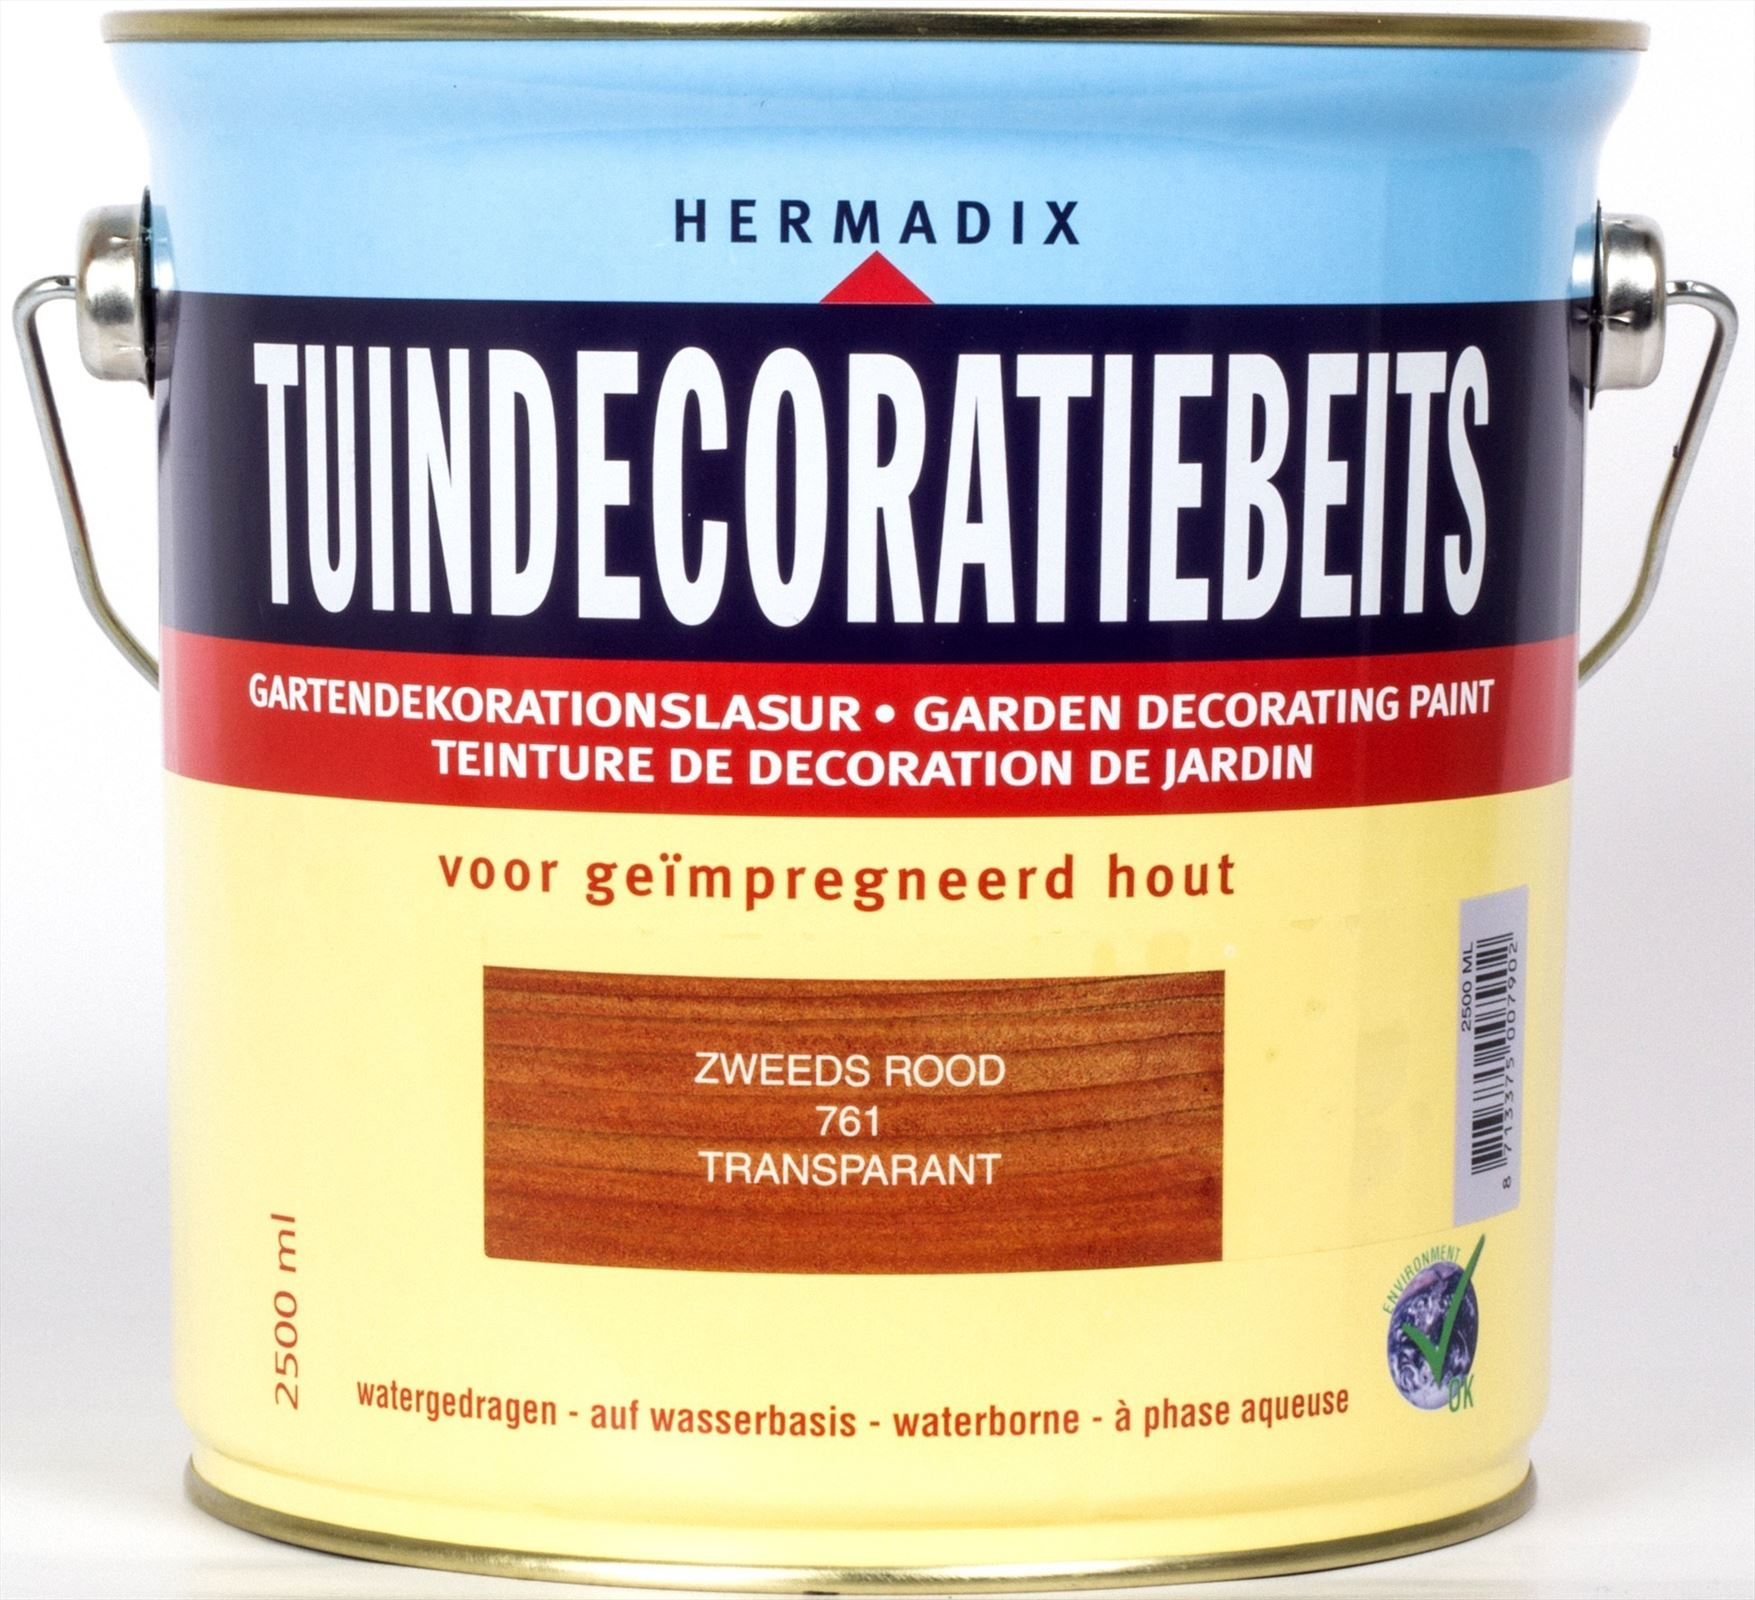 Hermadix beits Hermadix tuindecoratiebeits, transparant, nr. 761 zweeds rood, blik 2,5 liter